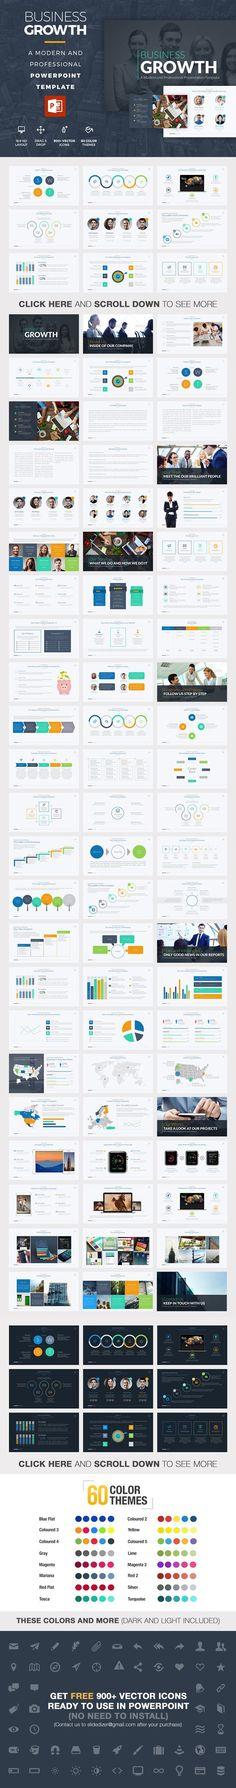 3 beautiful powerpoint templates free via goanimates video business growth powerpoint template business infographic 1500 toneelgroepblik Image collections